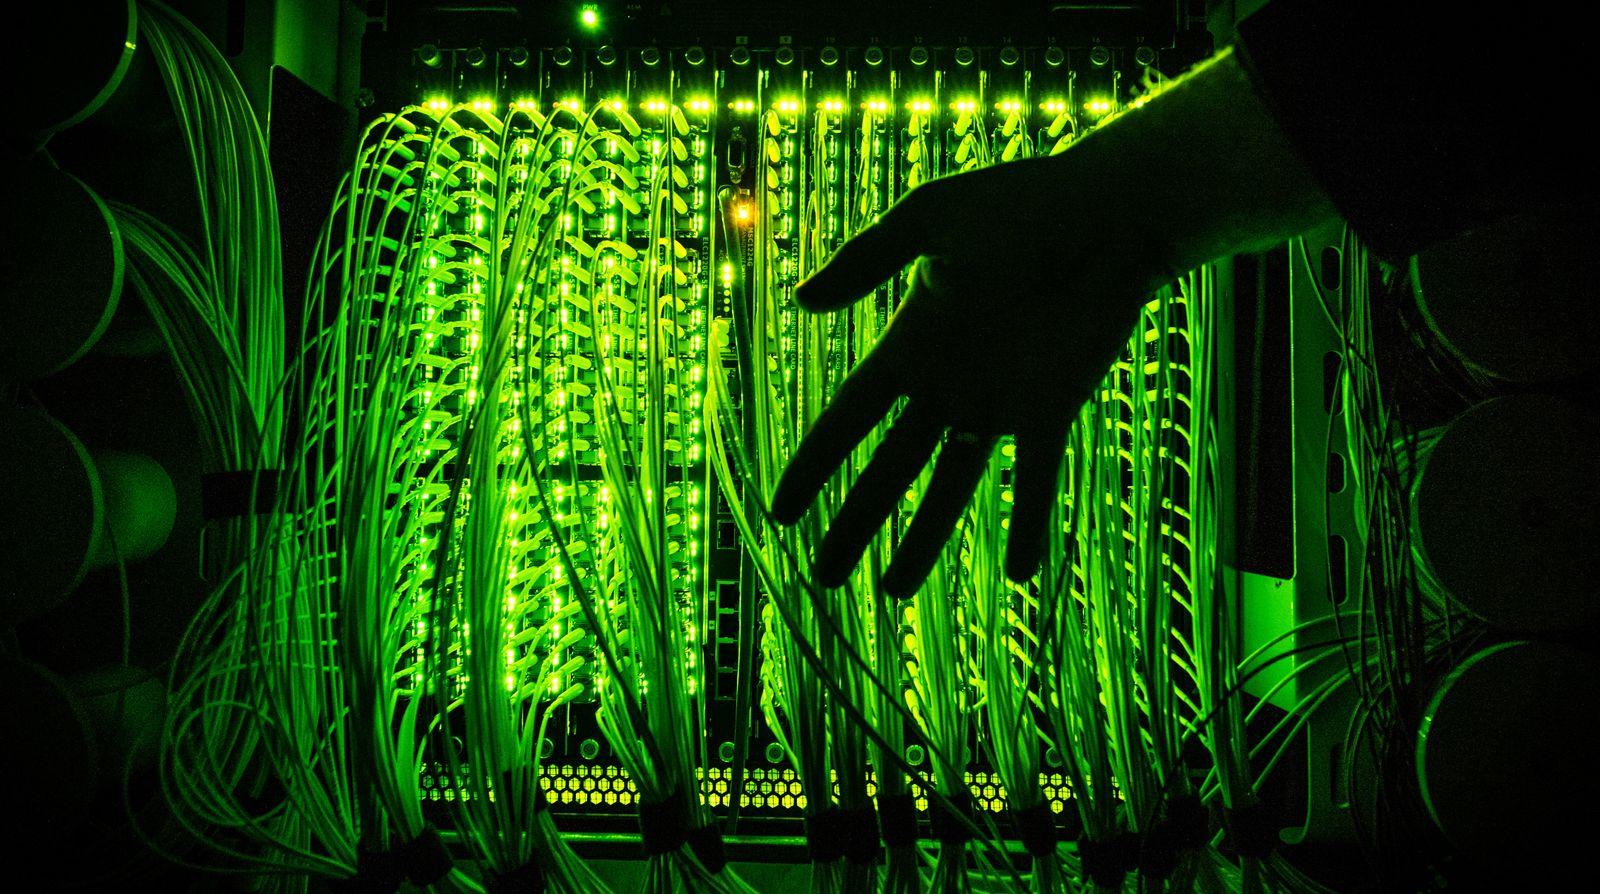 Glasfaserkabel/ Netzausbau - Internet